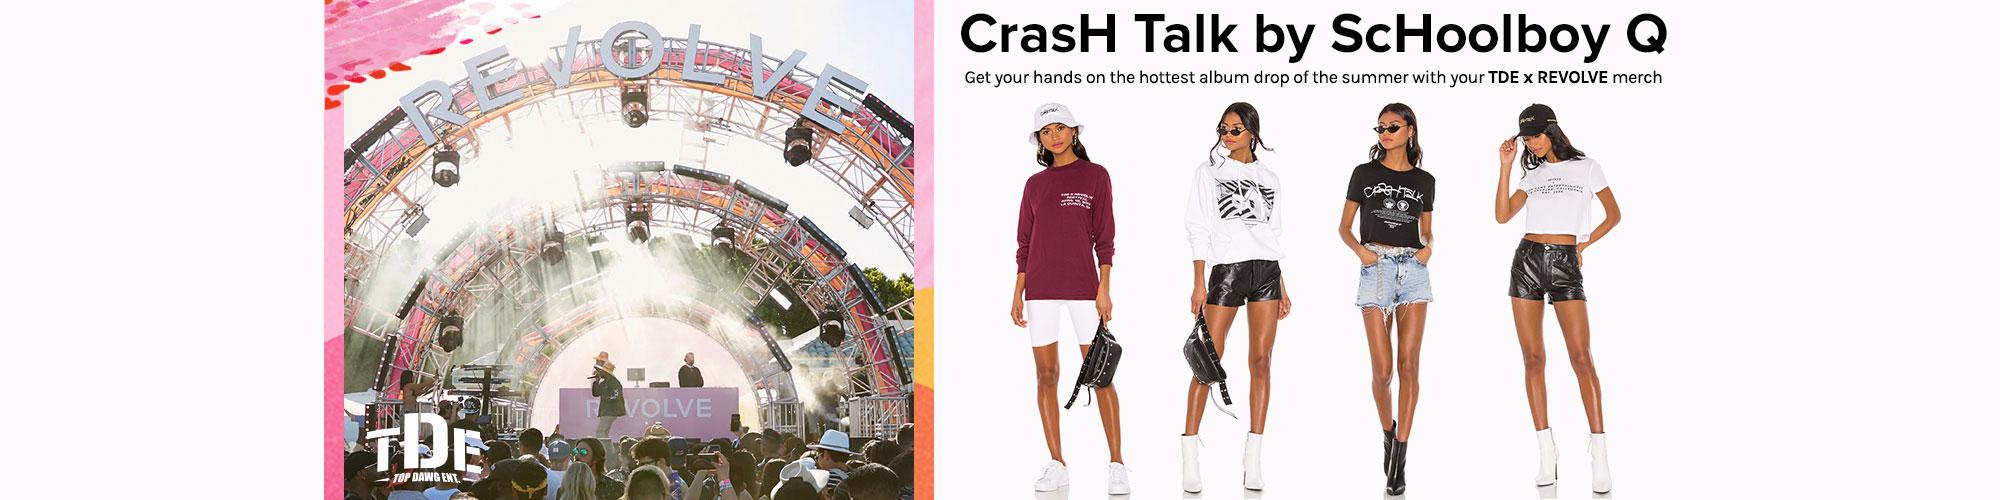 CrasH Talk by ScHoolboy Q. Get your hands on the hottest album drop of the summer with your TDE x REVOLVE merch. SHOP TDE X REVOLVE MERCH